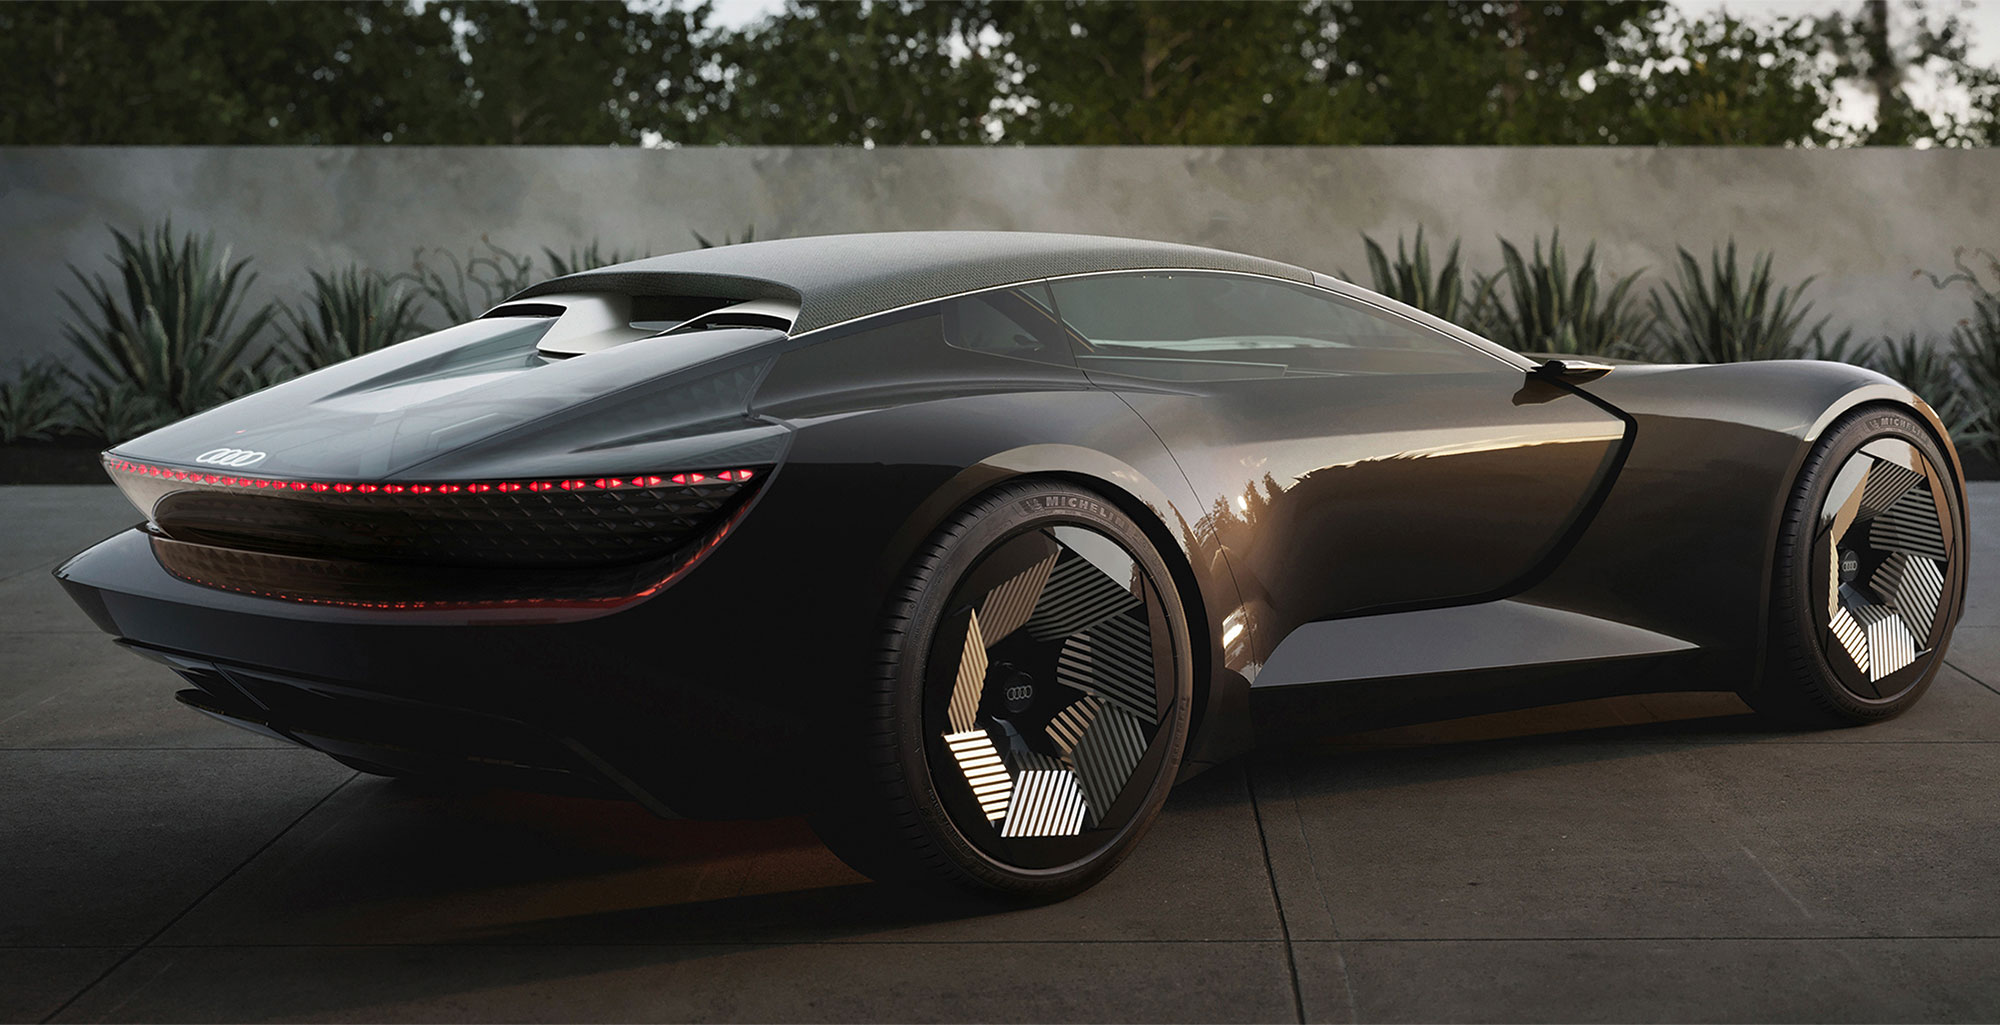 2021 Audi Skysphere Concept Roadster